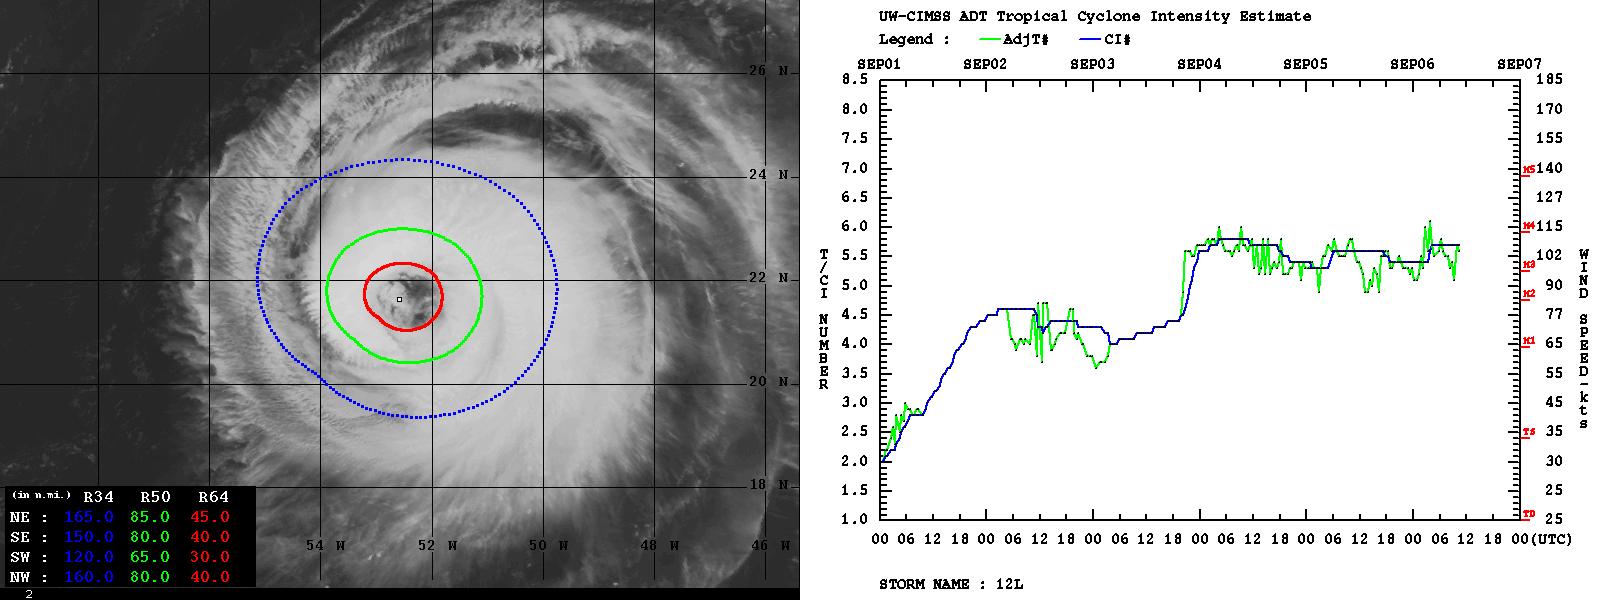 atlantic-hurricane-season-larry-bermuda-dvorak-analysis